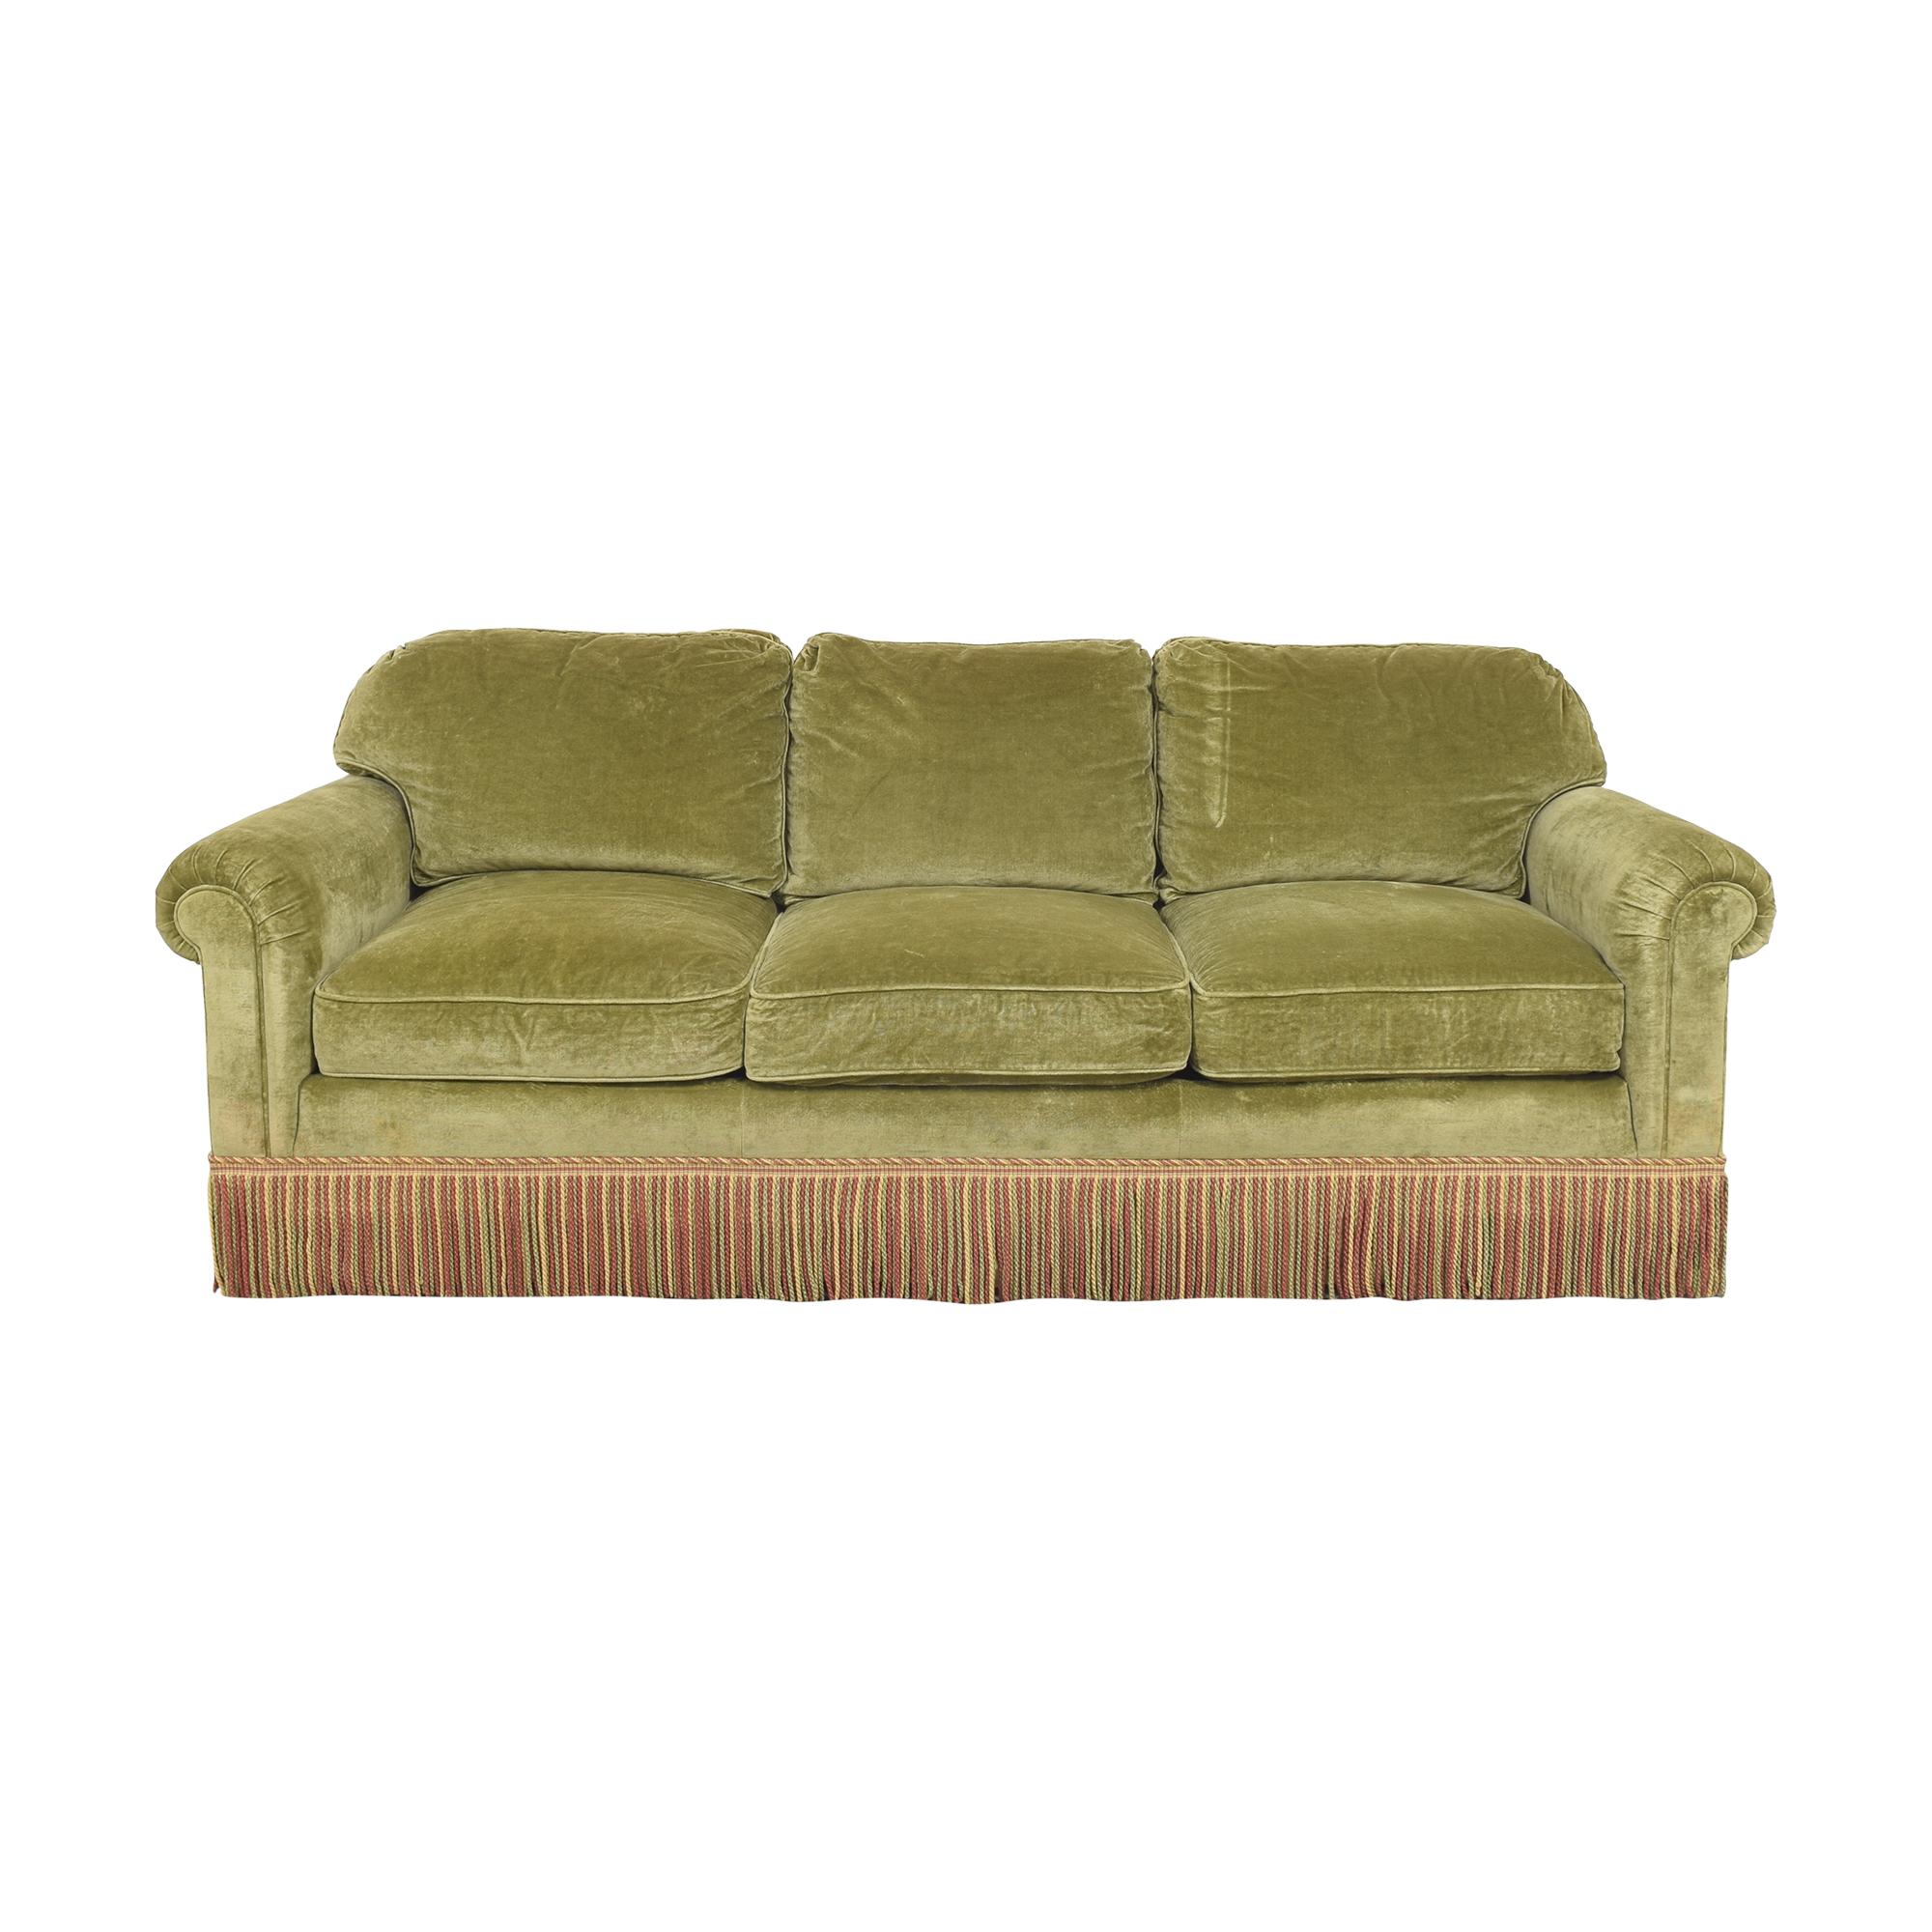 Ferrell Mittman Edward Ferrell Ltd. Custom Fringe Skirt Sofa nyc